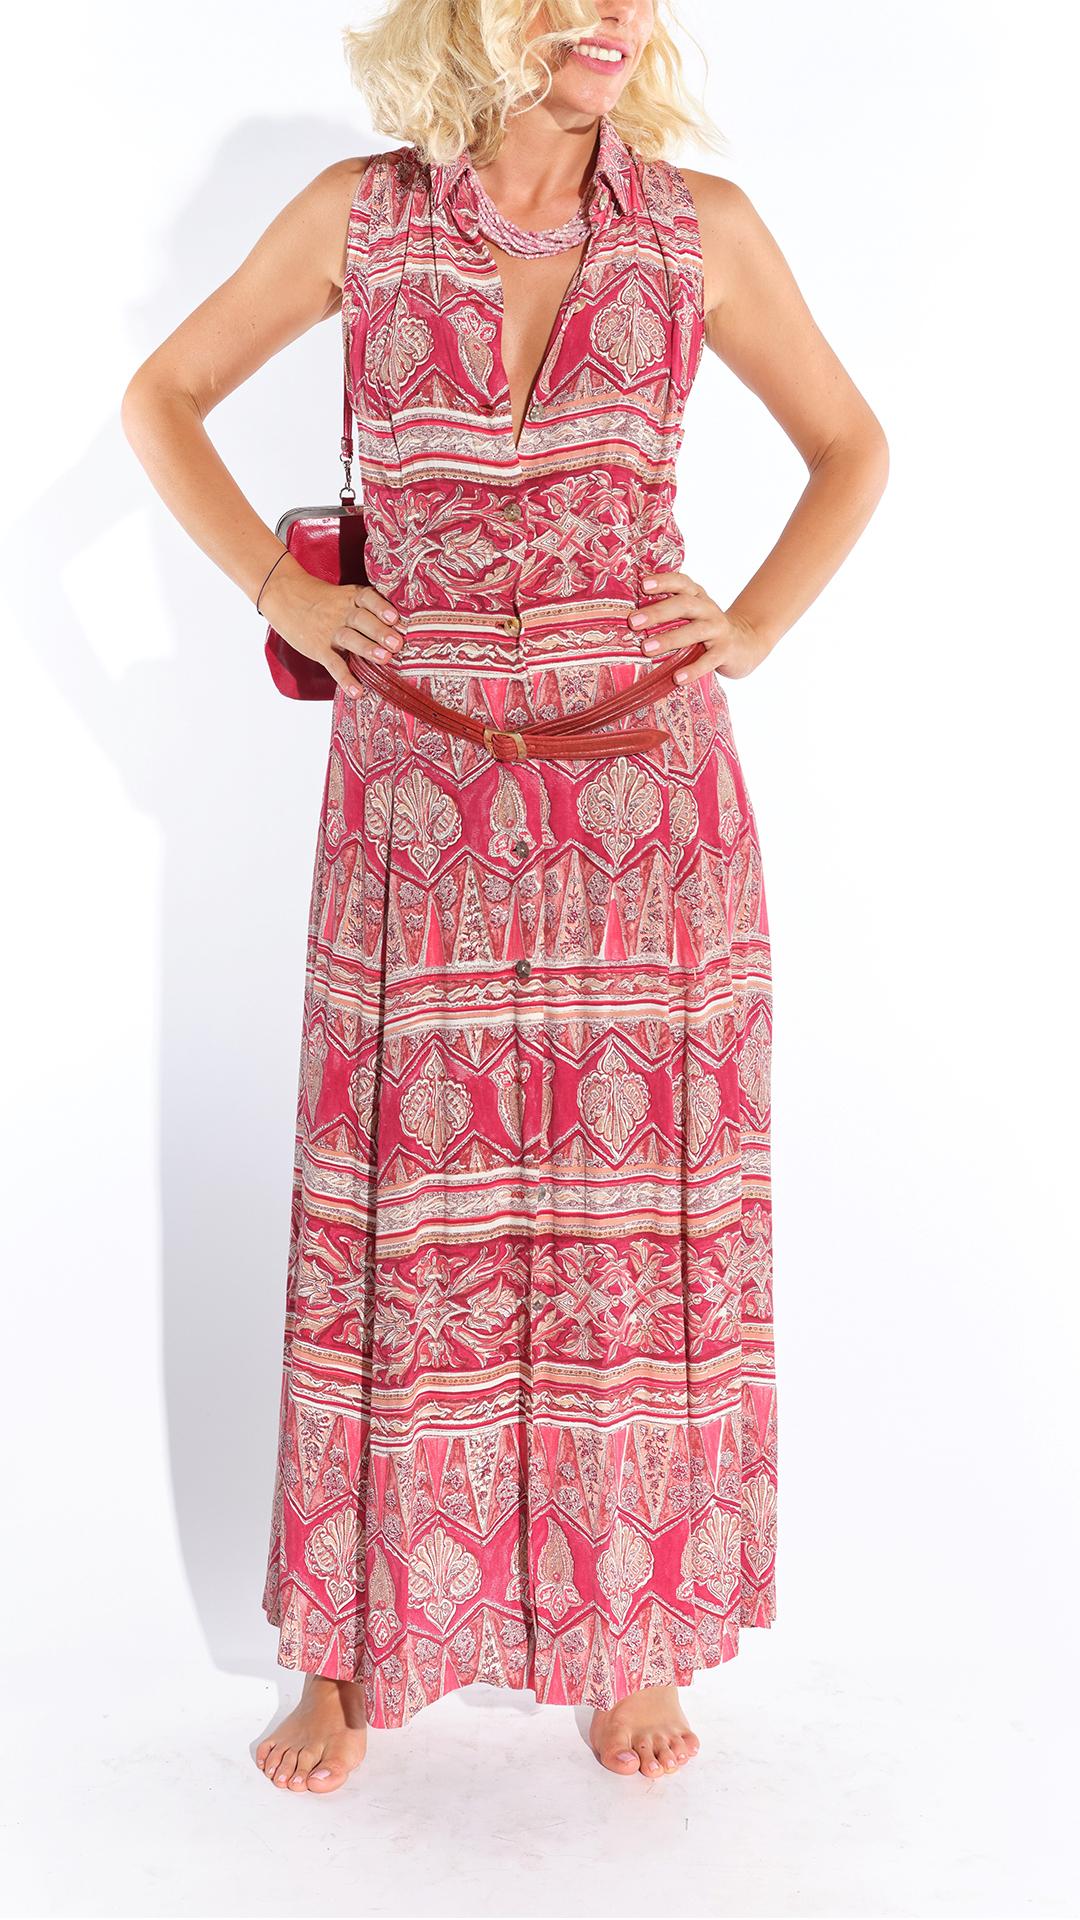 90lar pamuklu emprime desenli elbise